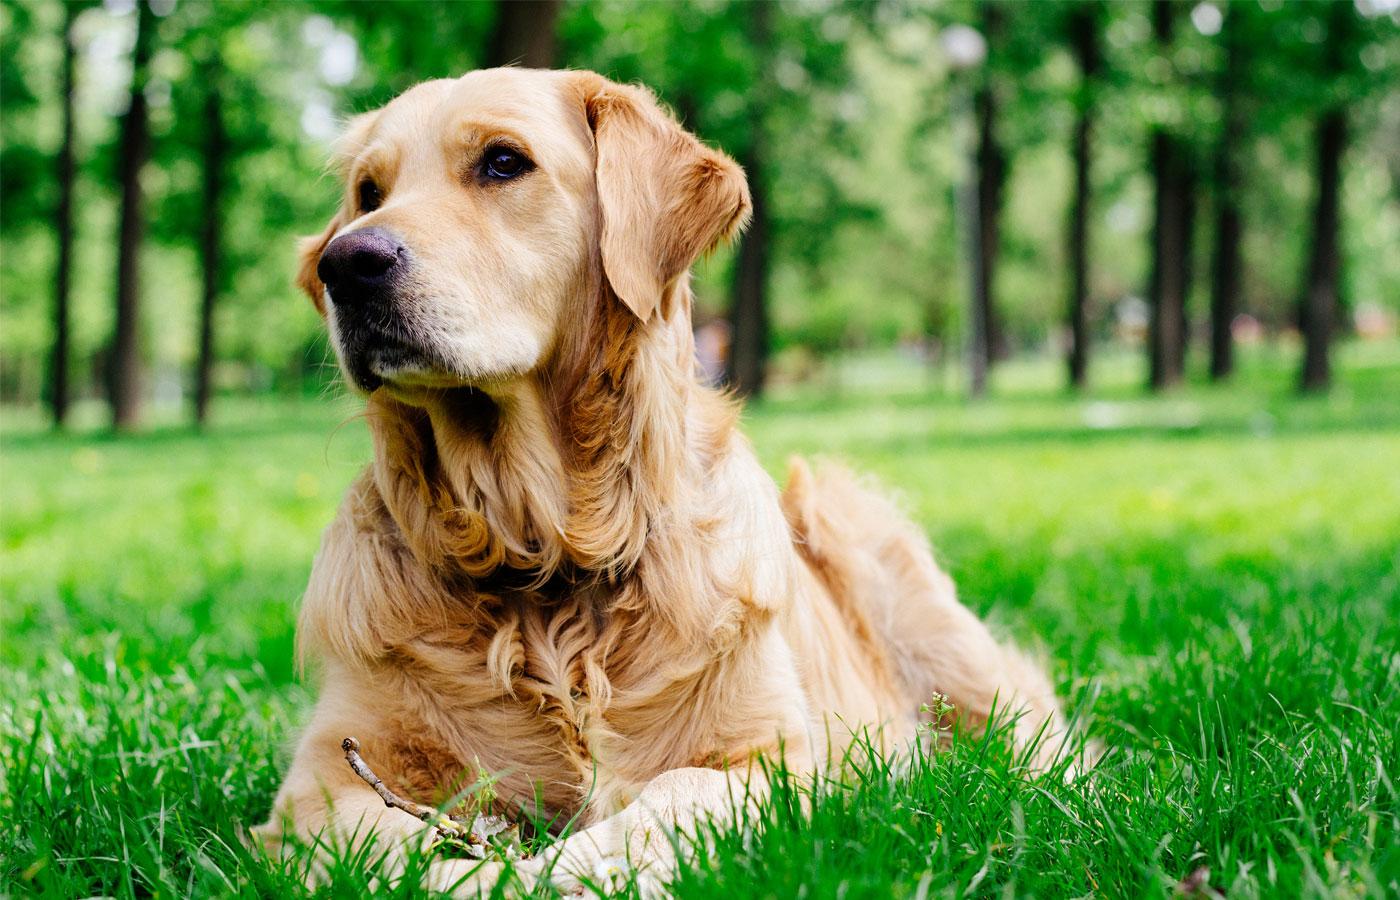 Golden Retriever listening